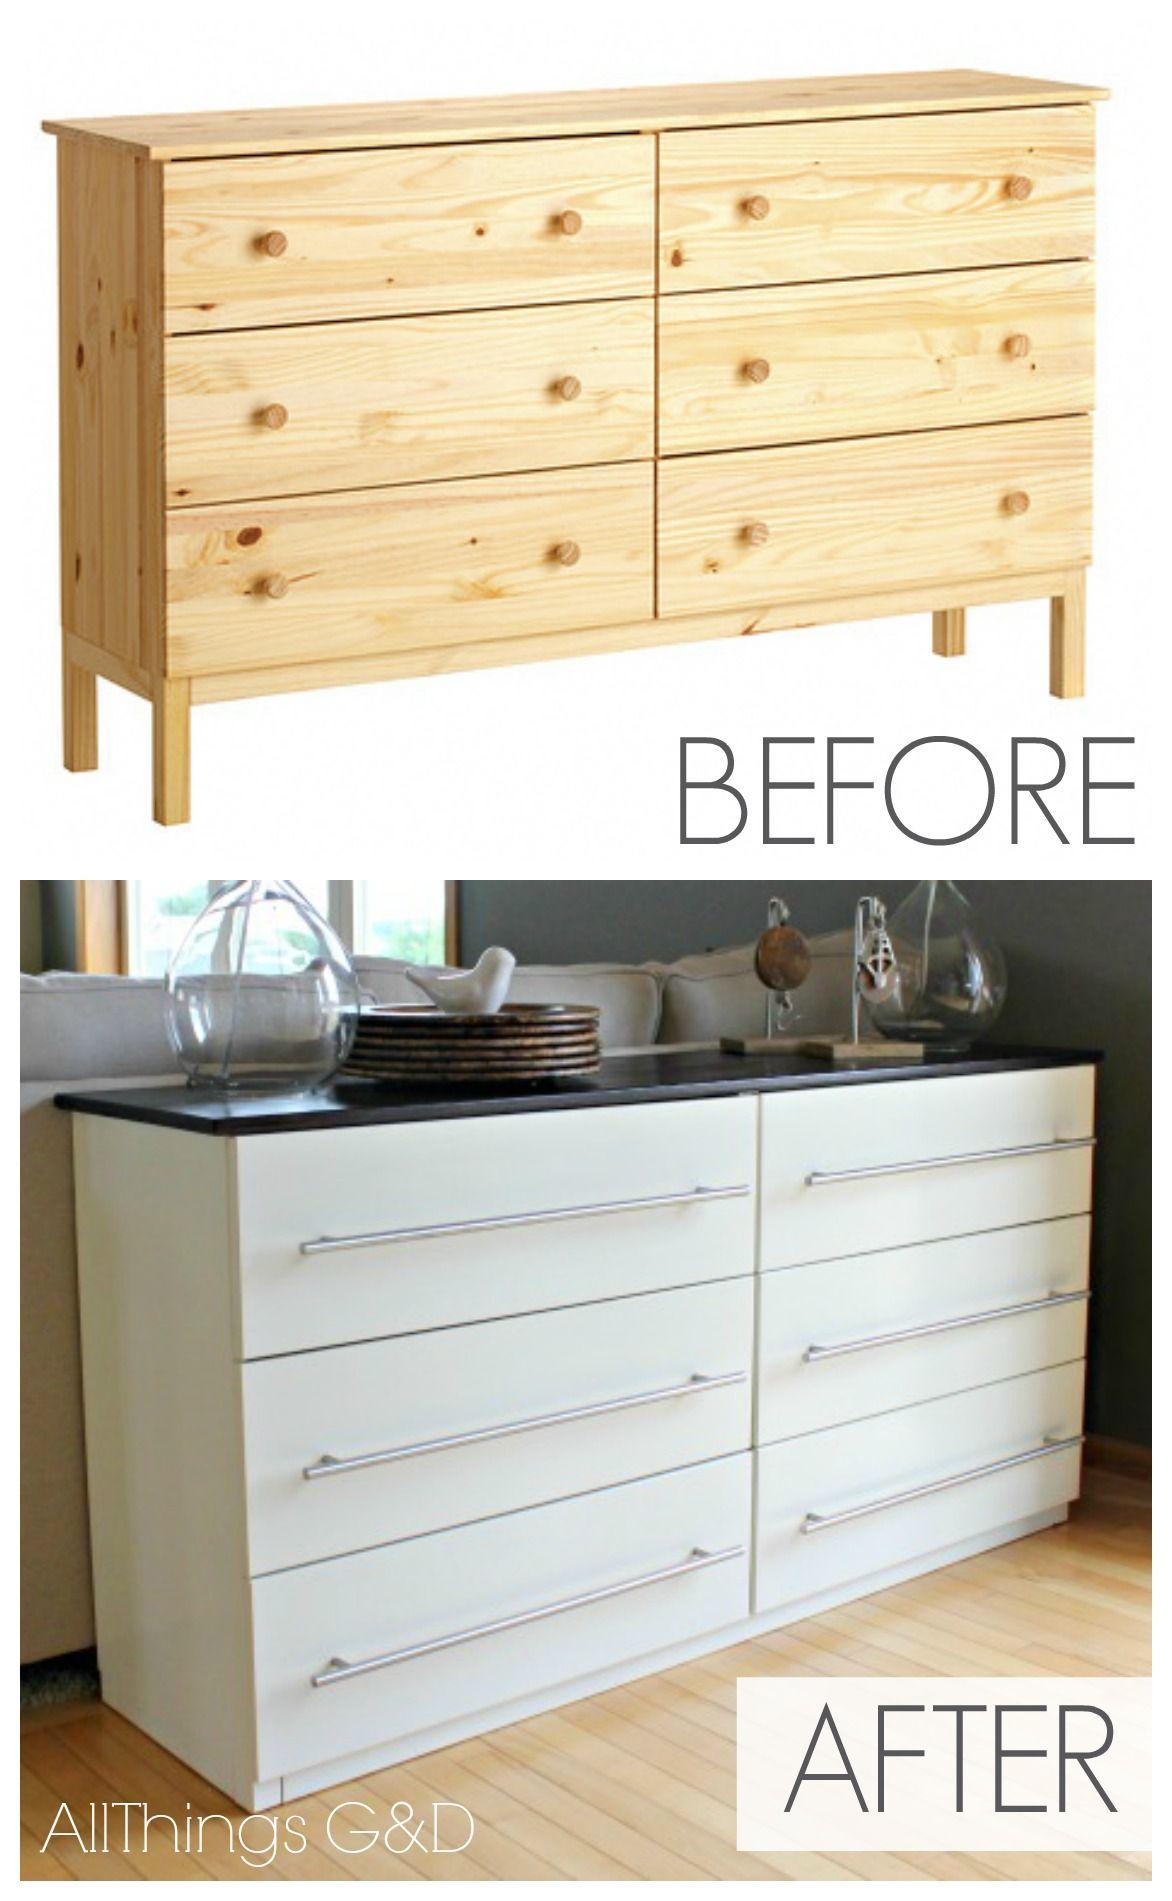 Need more kitchen storage transform an ikea tarva bedroom dresser